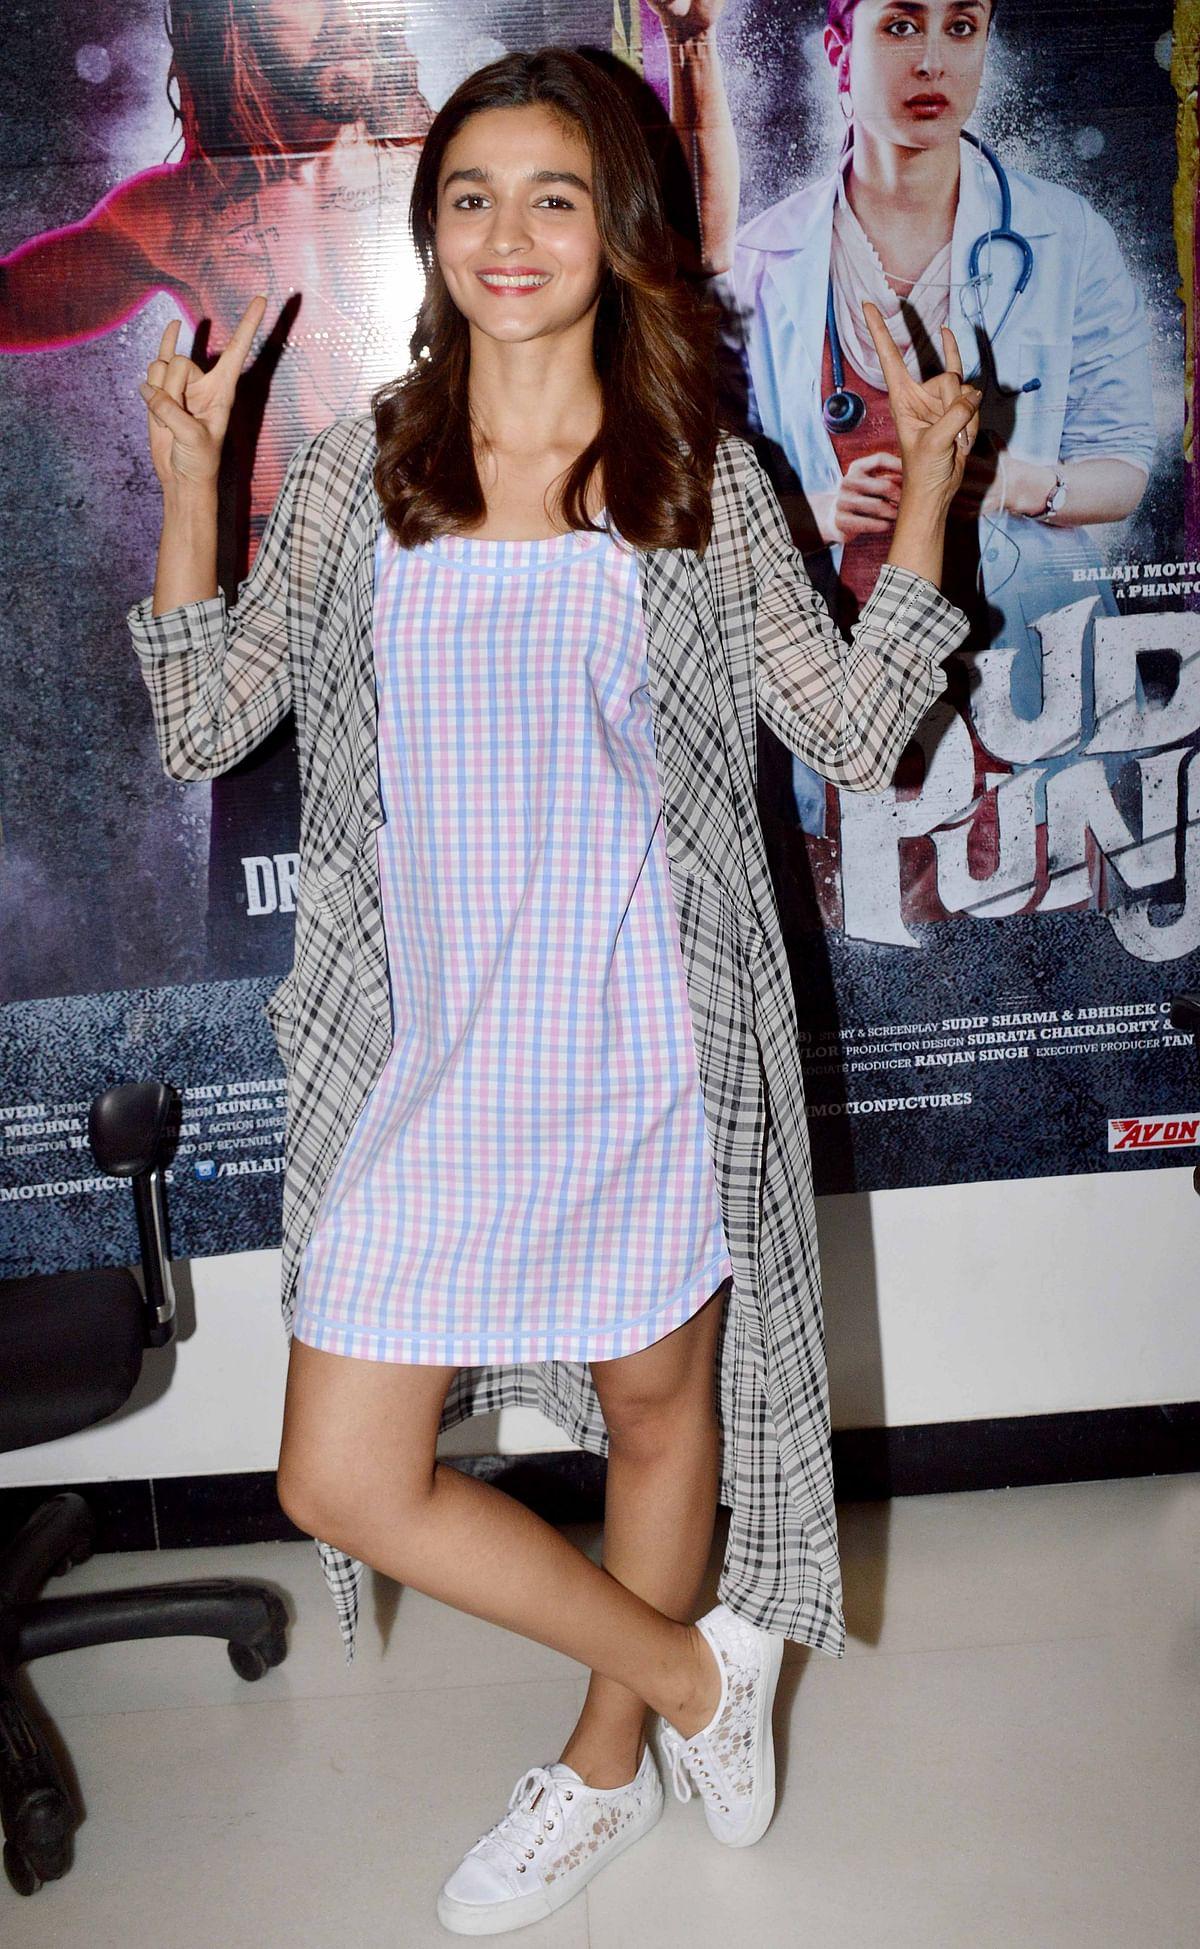 The <i>Udta Punjab</i> actress aces it with checks (Photo: Yogen Shah)